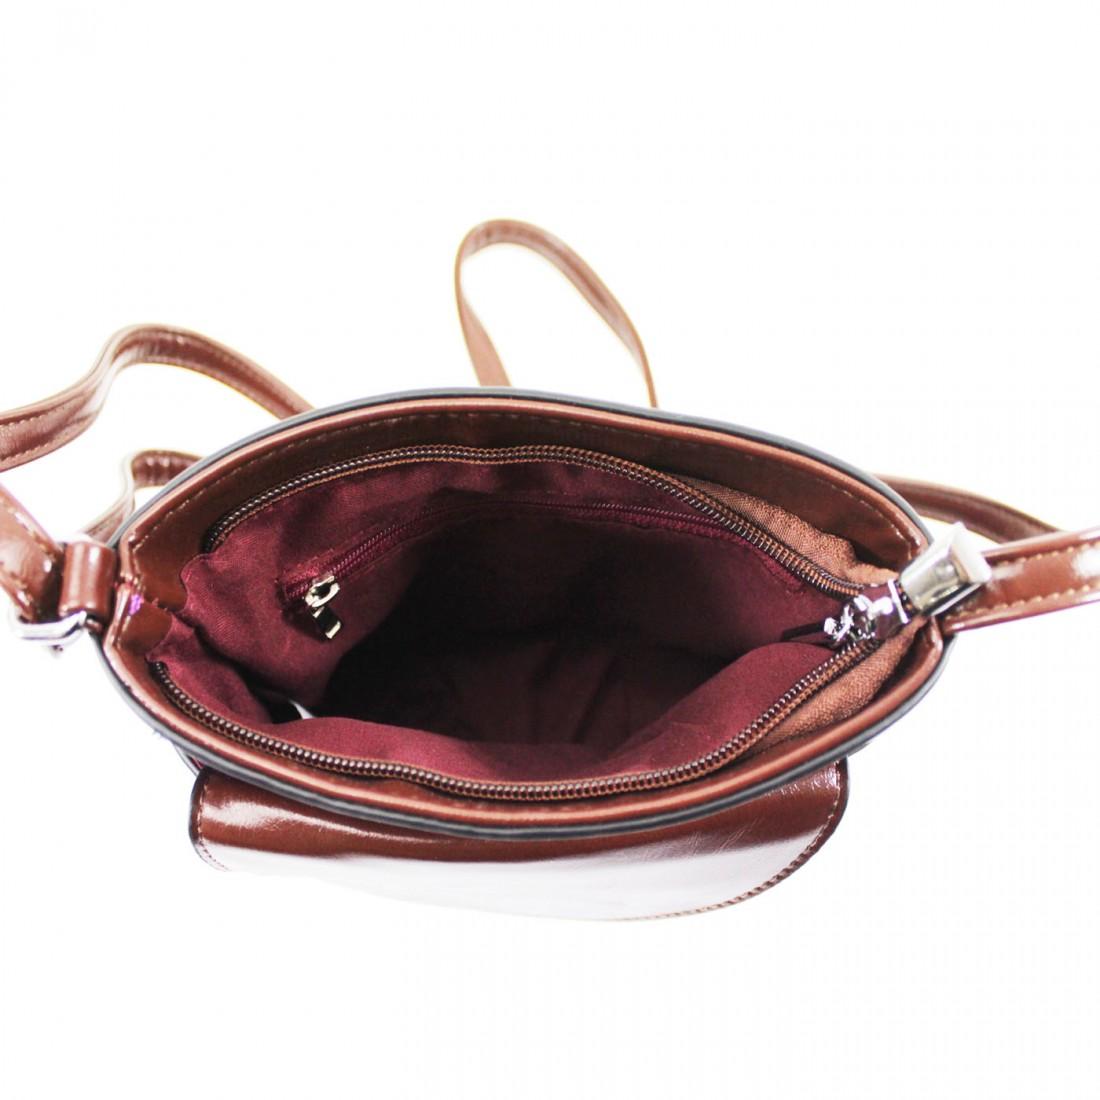 2 Tone Small Cross Body Handbag - Dark Grey